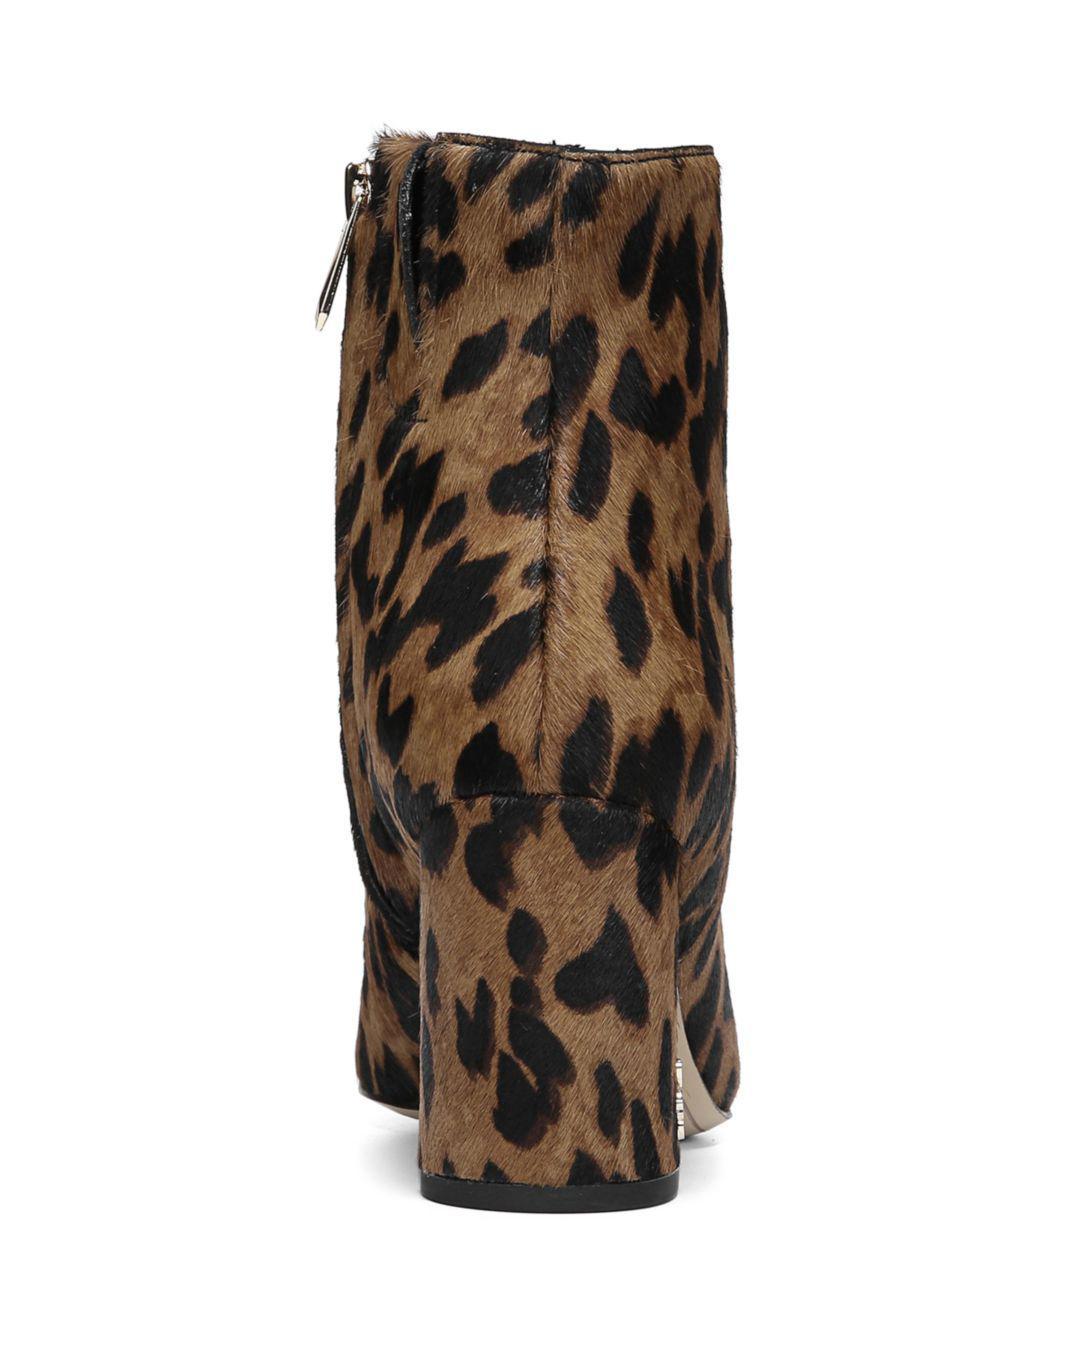 b4dc740a8 Sam Edelman - Brown Women s Hilty Leopard Print Calf Hair Booties - Lyst.  View fullscreen